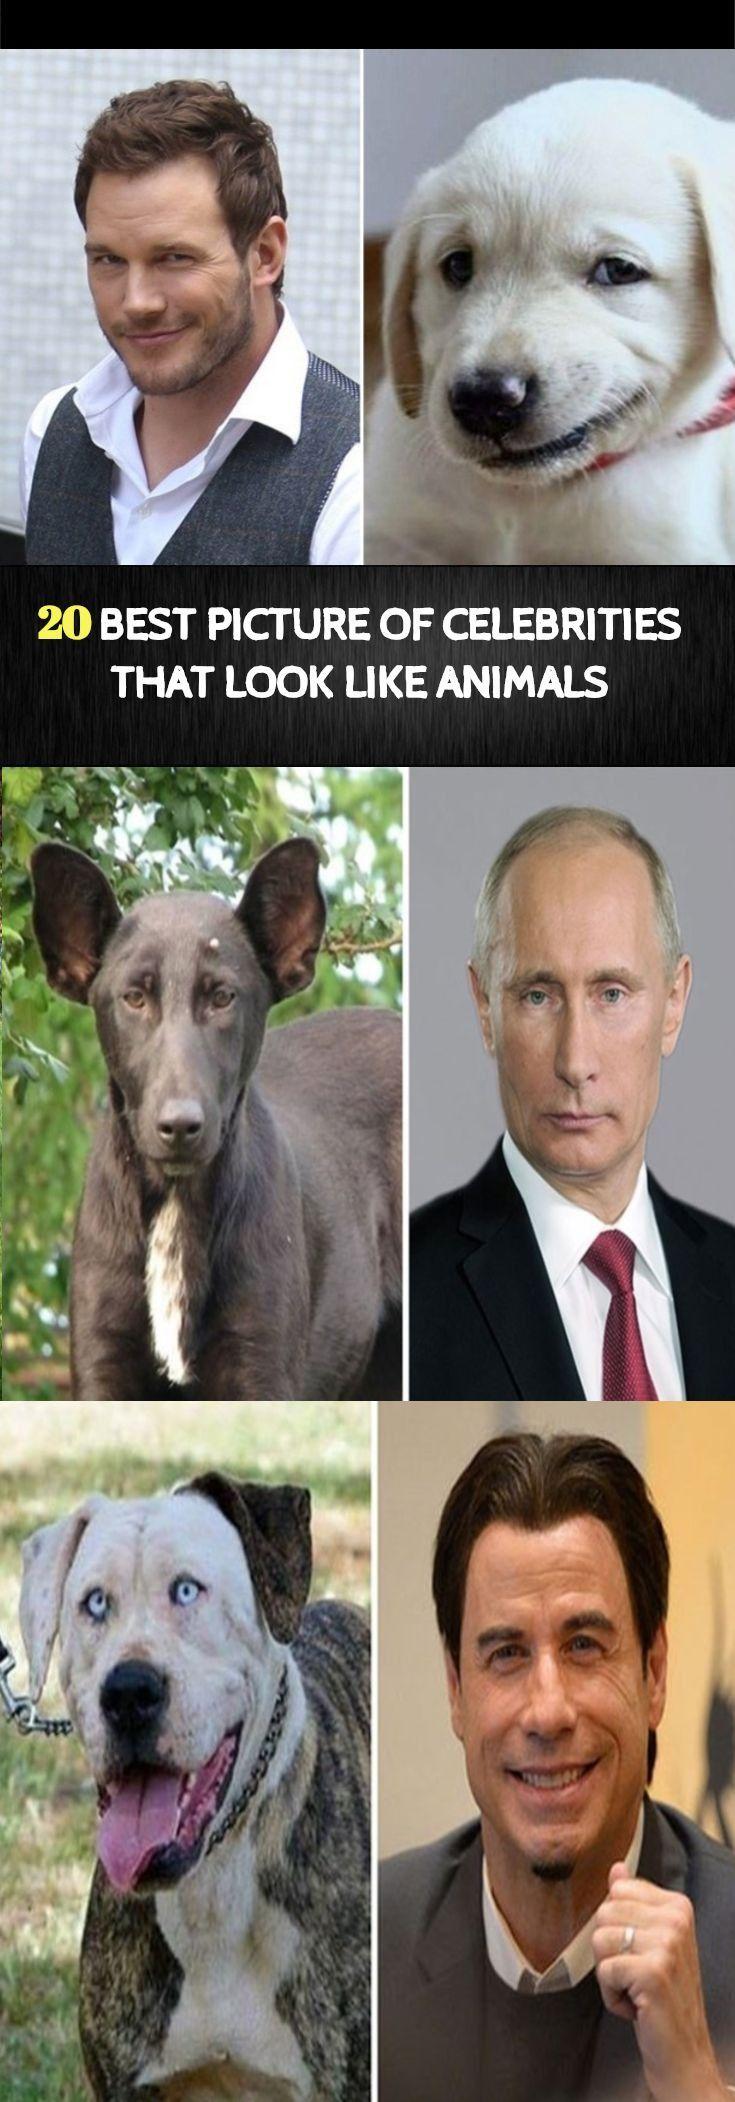 14++ Animals that look like celebrities ideas in 2021